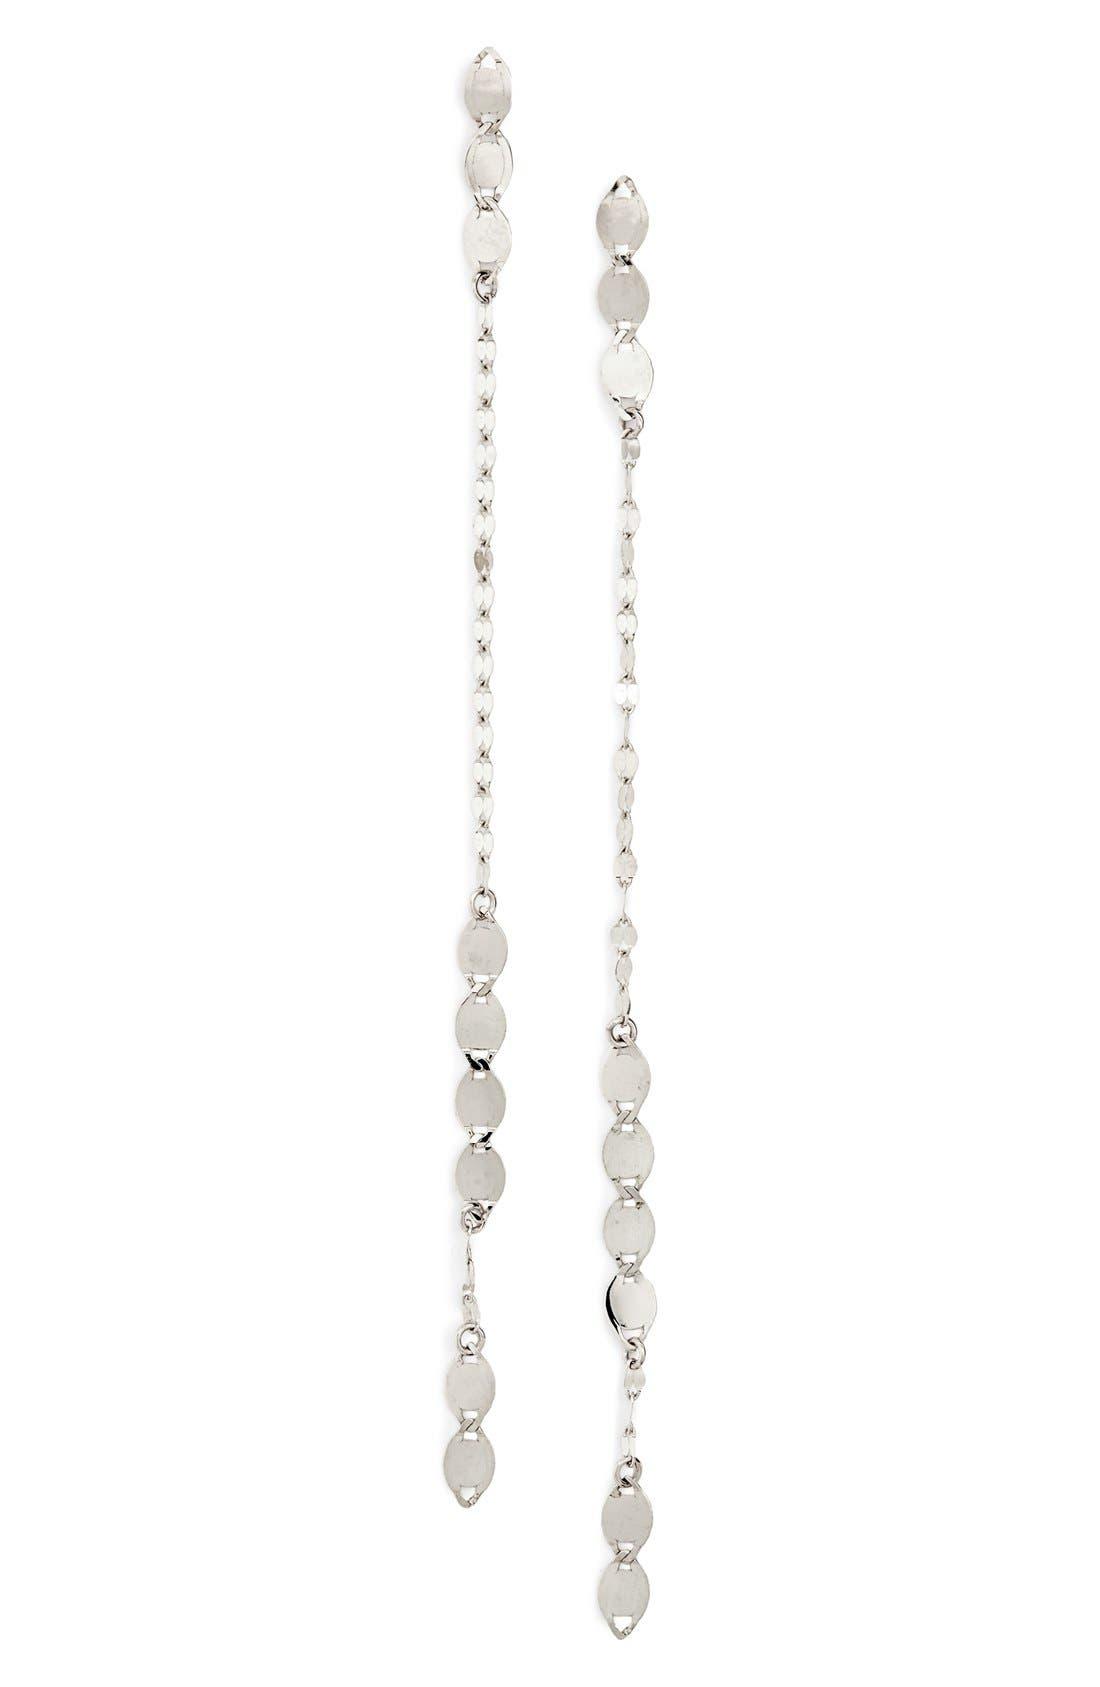 Alternate Image 1 Selected - Lana Jewelry Linear Drop Earrings